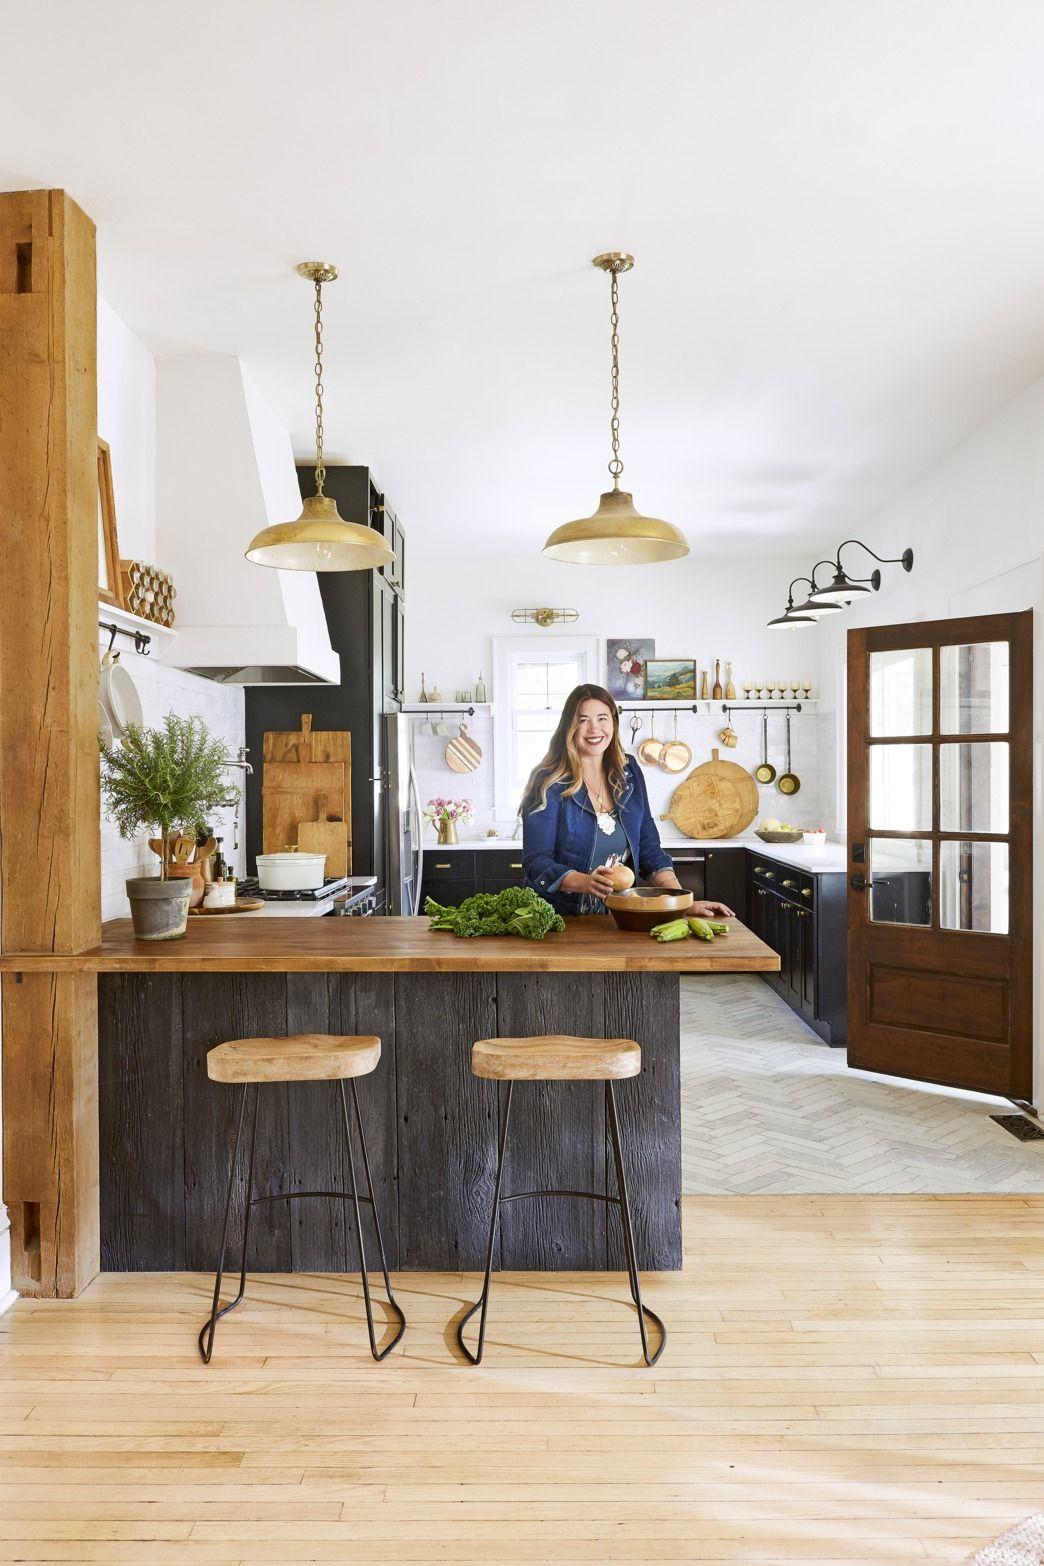 100 Best Kitchen Design Ideas Pictures Of Country Kitchen Decor